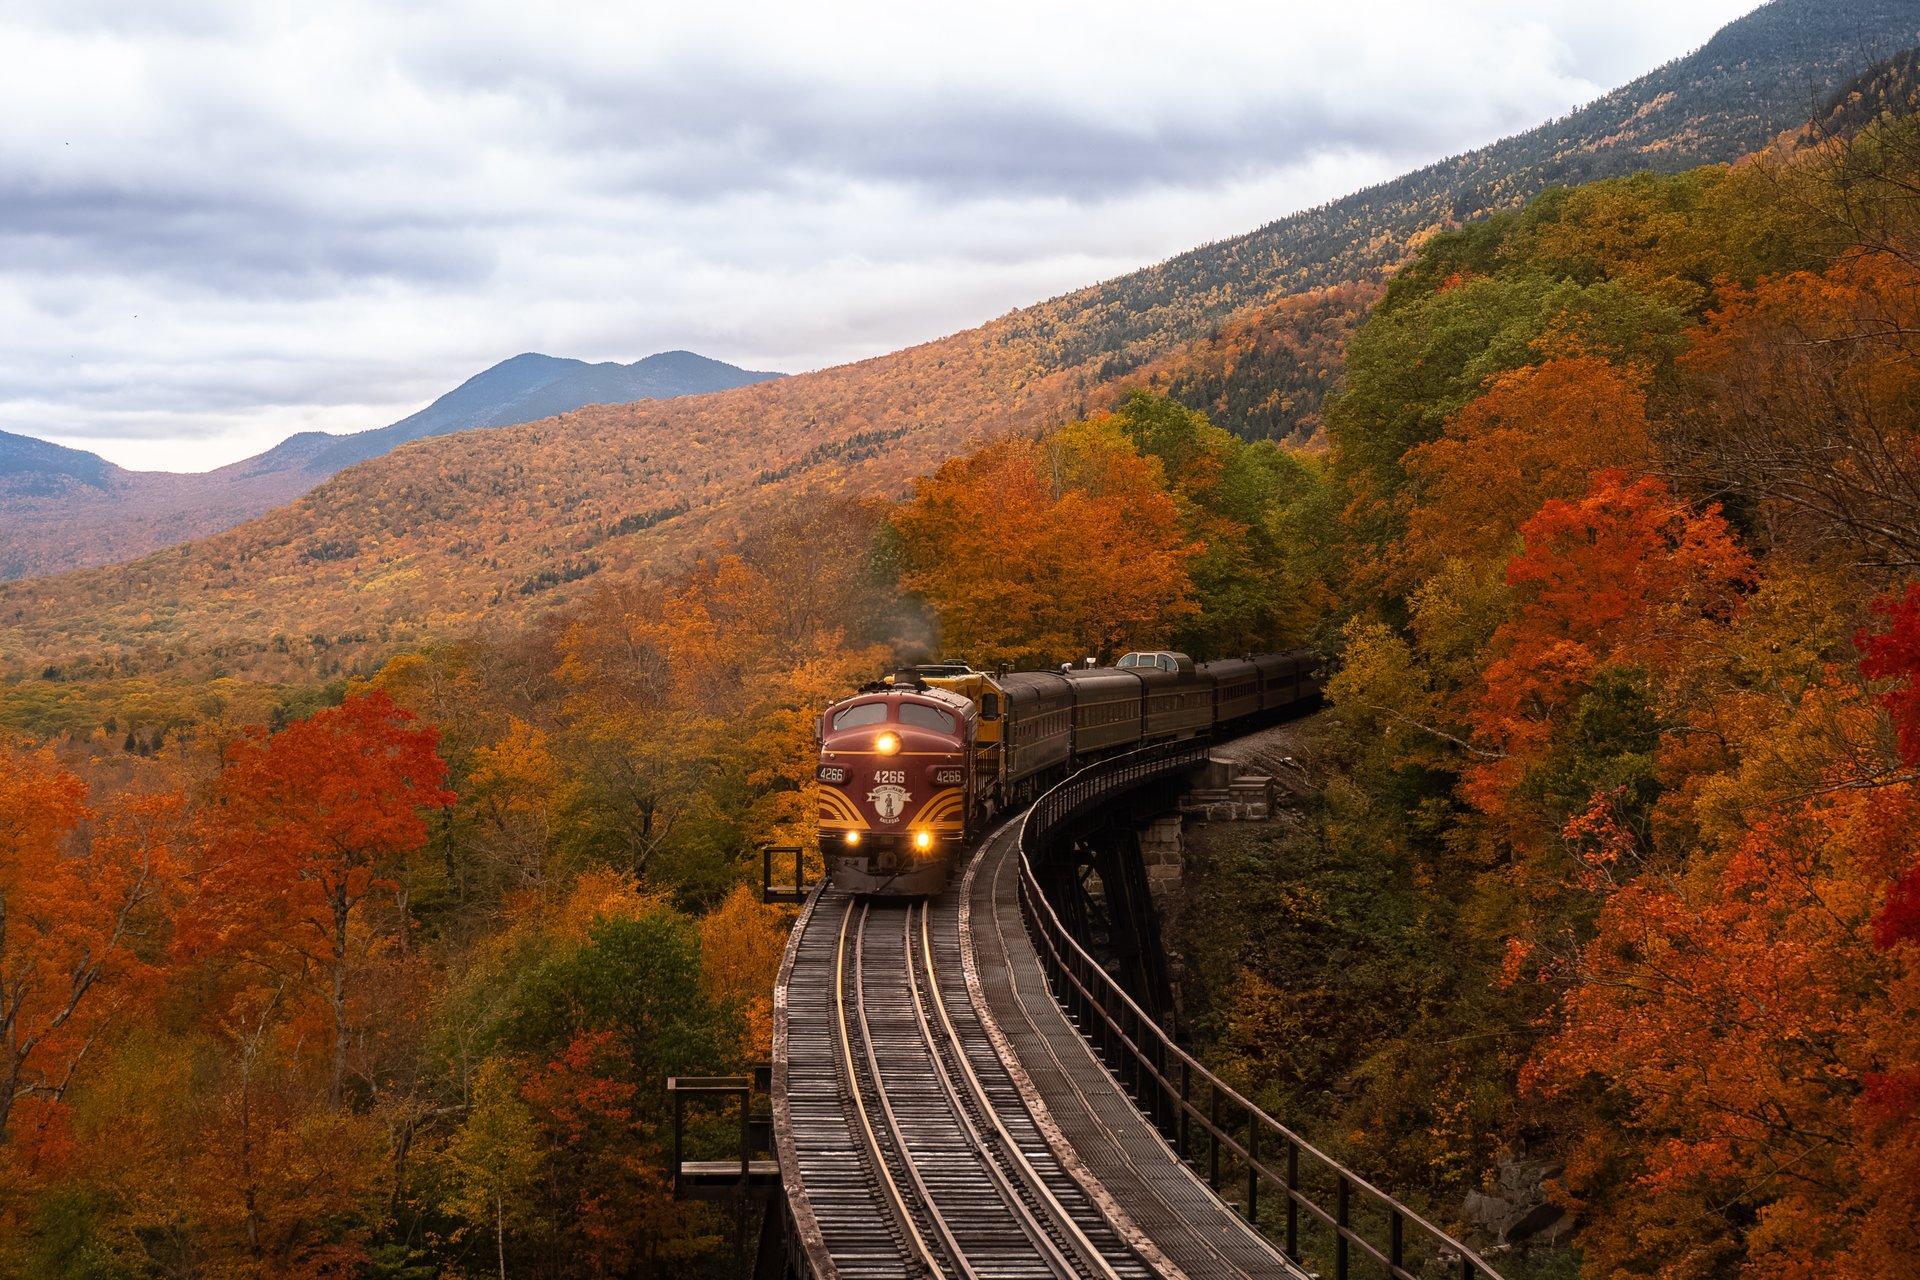 Fall Foliage in New England road trip itinerary Thumbnail